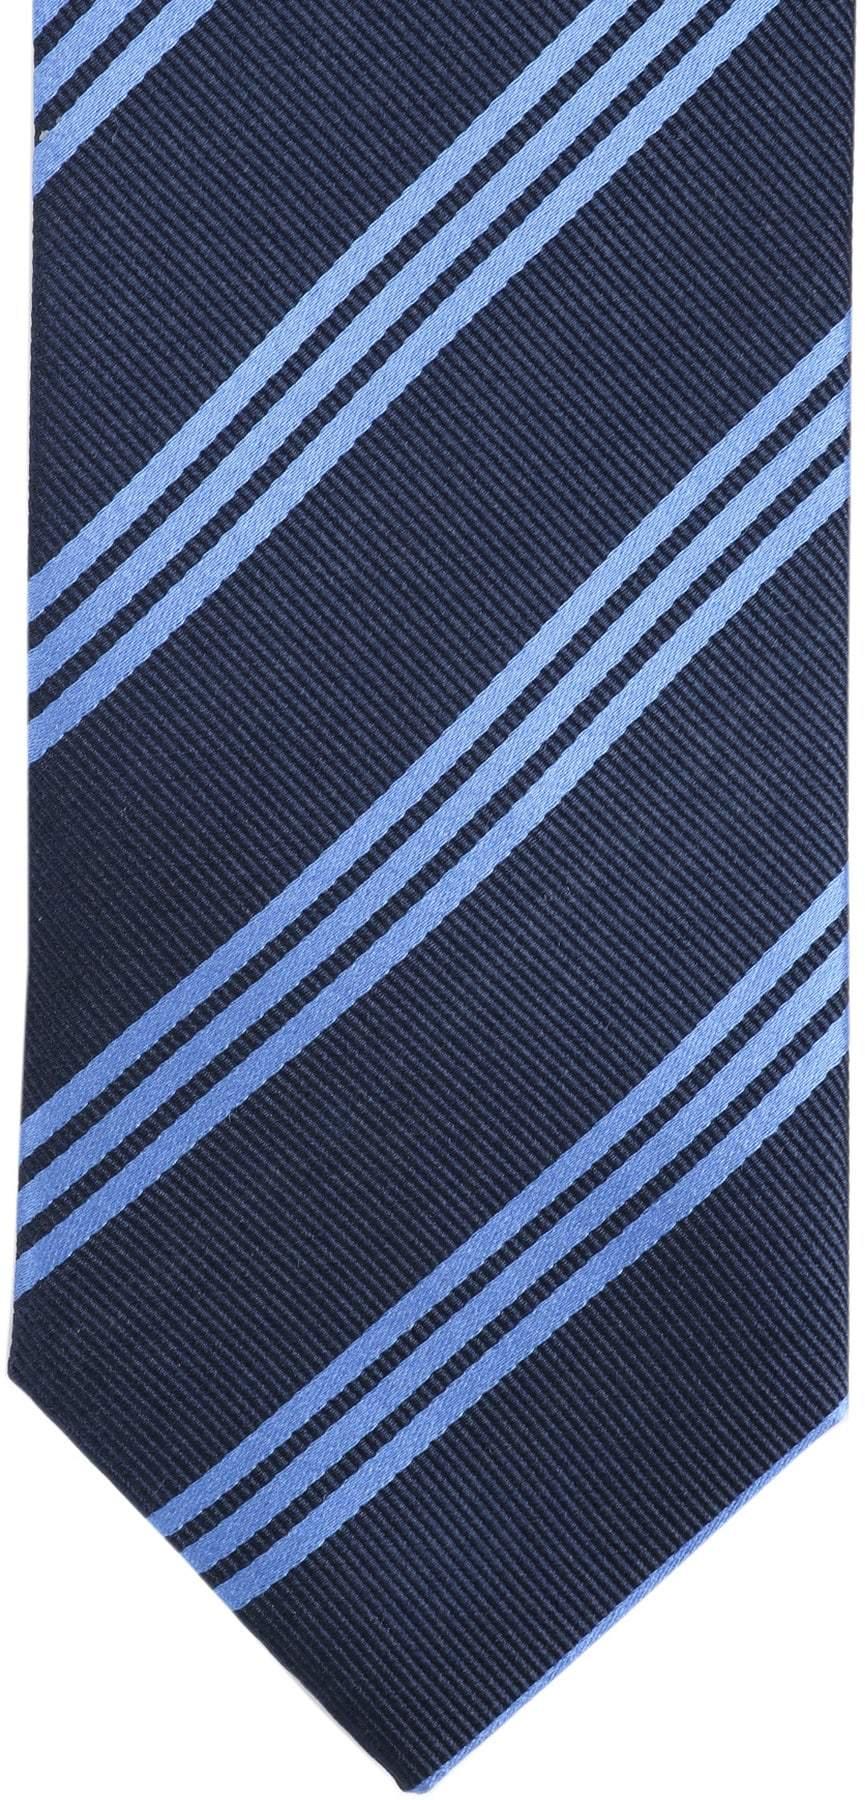 Krawatte Seide Streifen Navy Blau foto 2